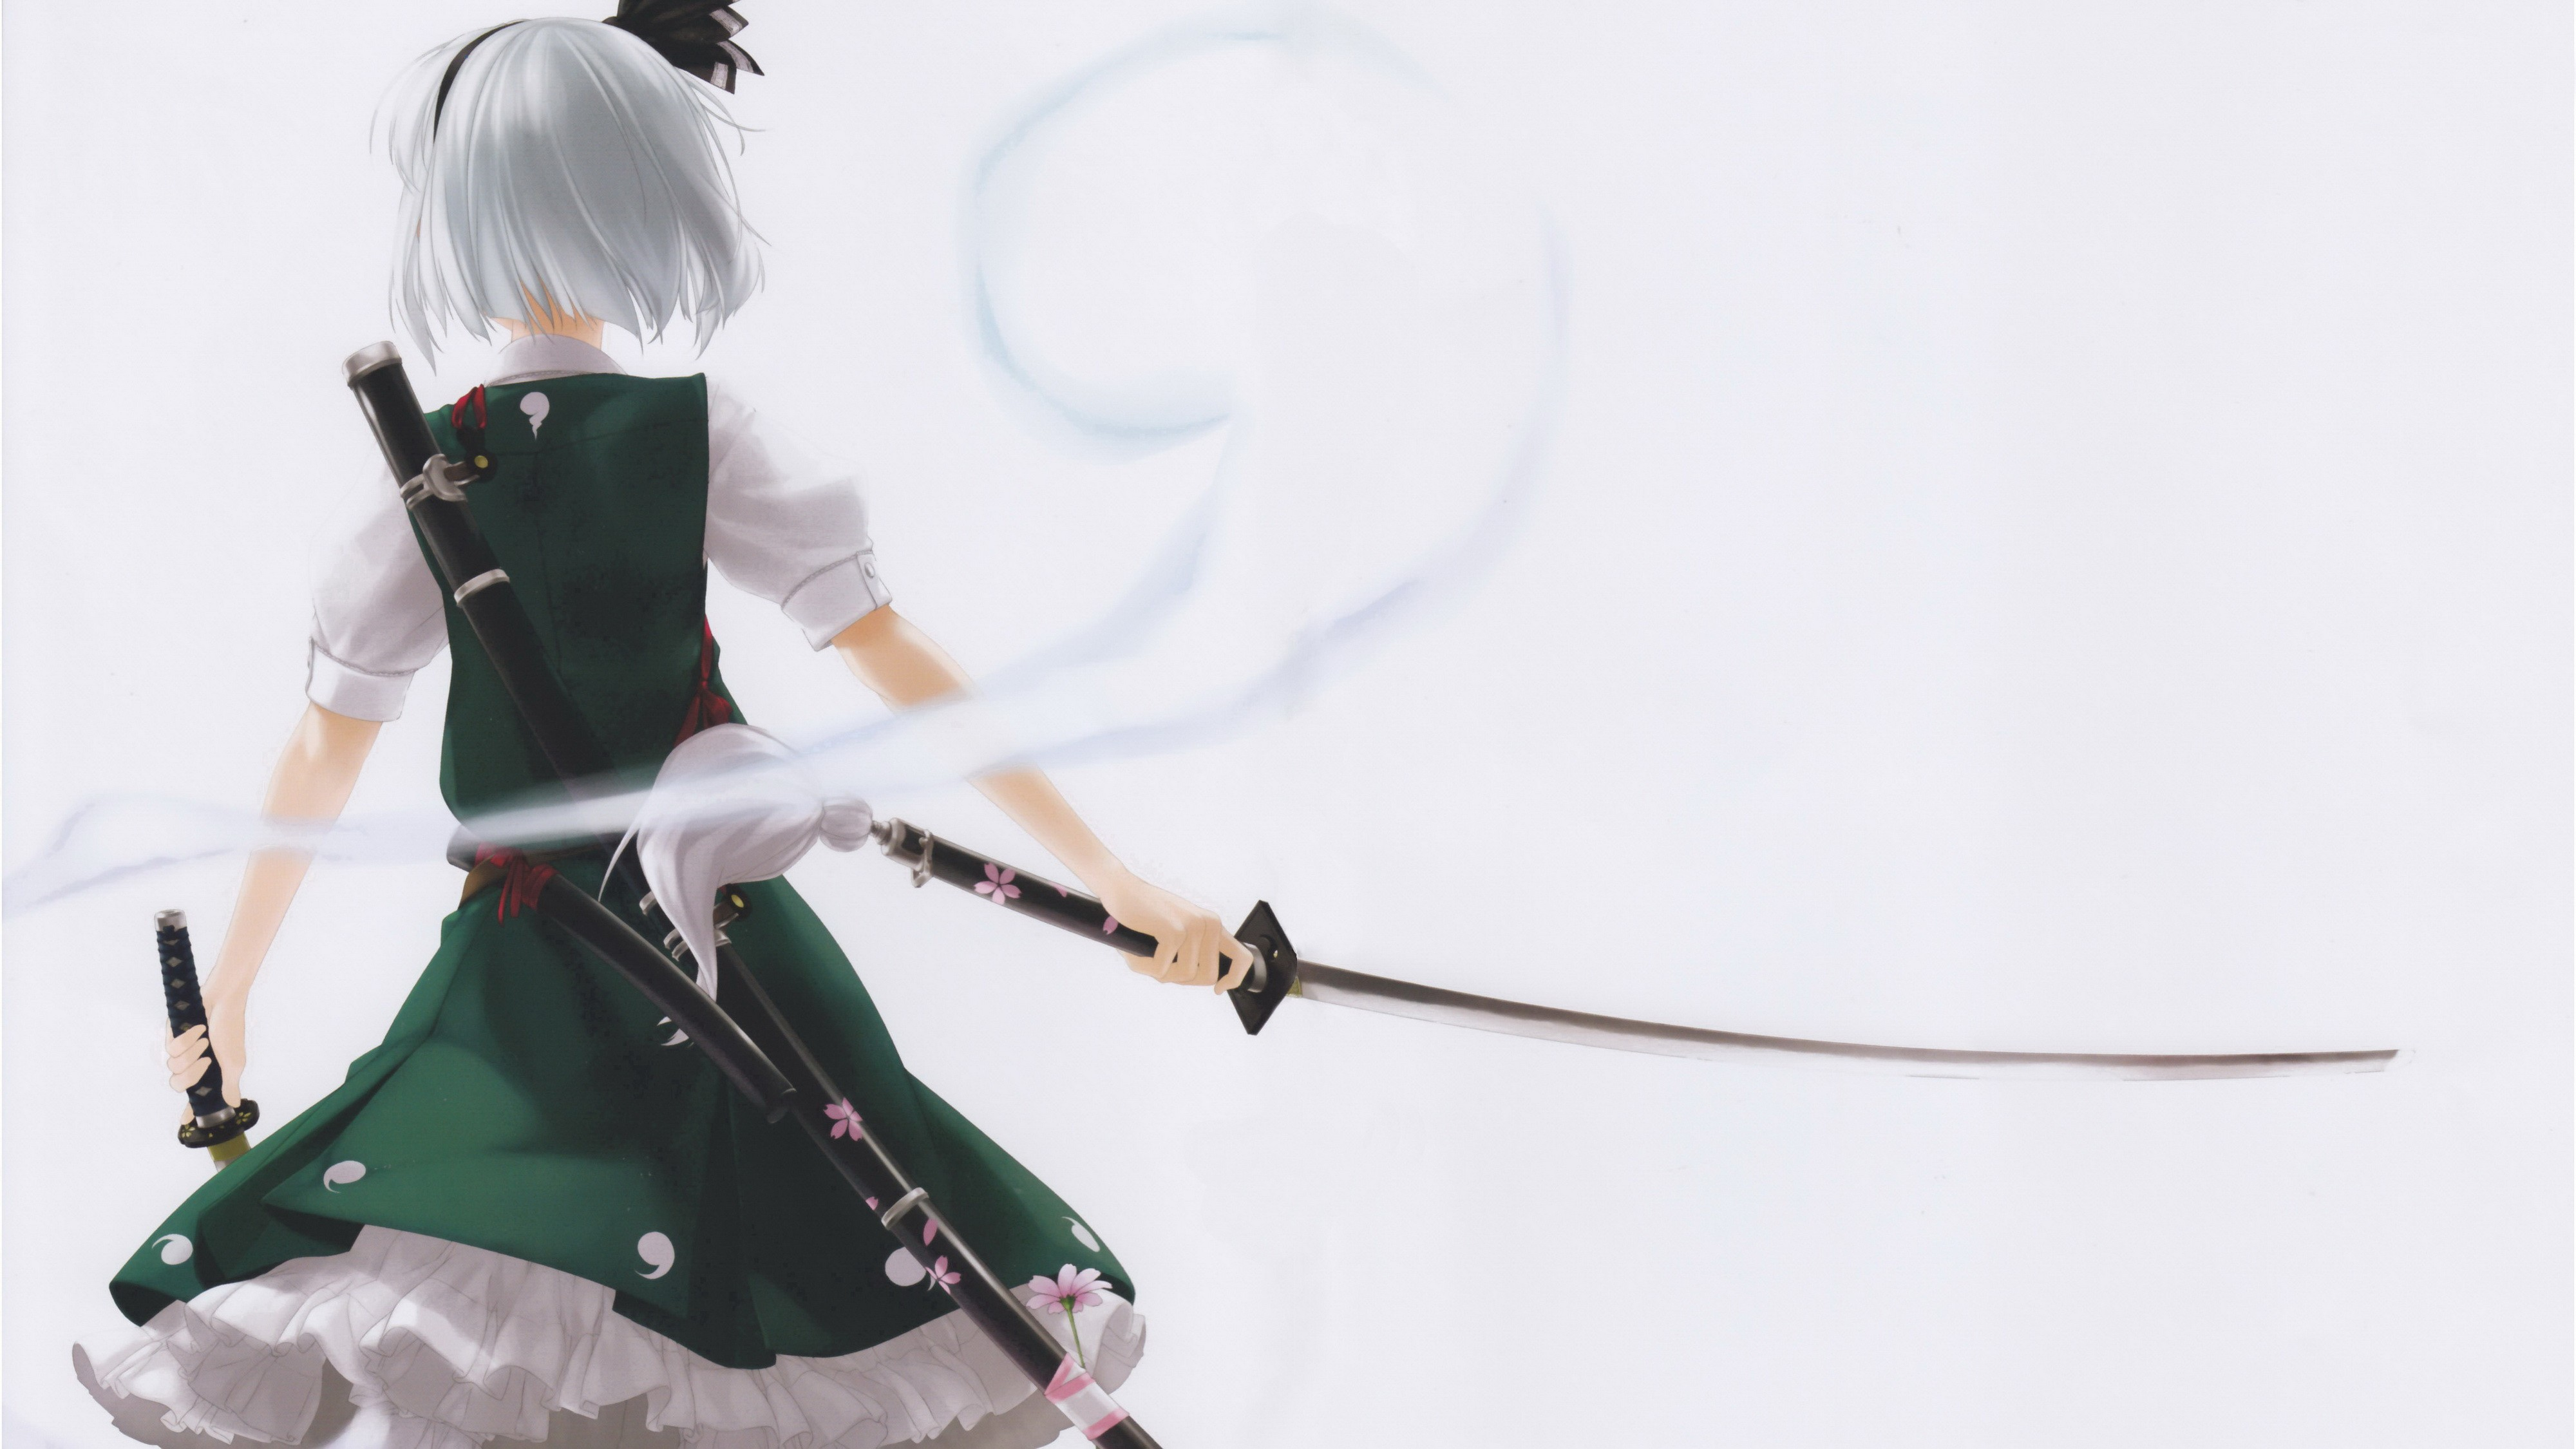 Video Games Touhou Dress Back Katana Samurai Weapons